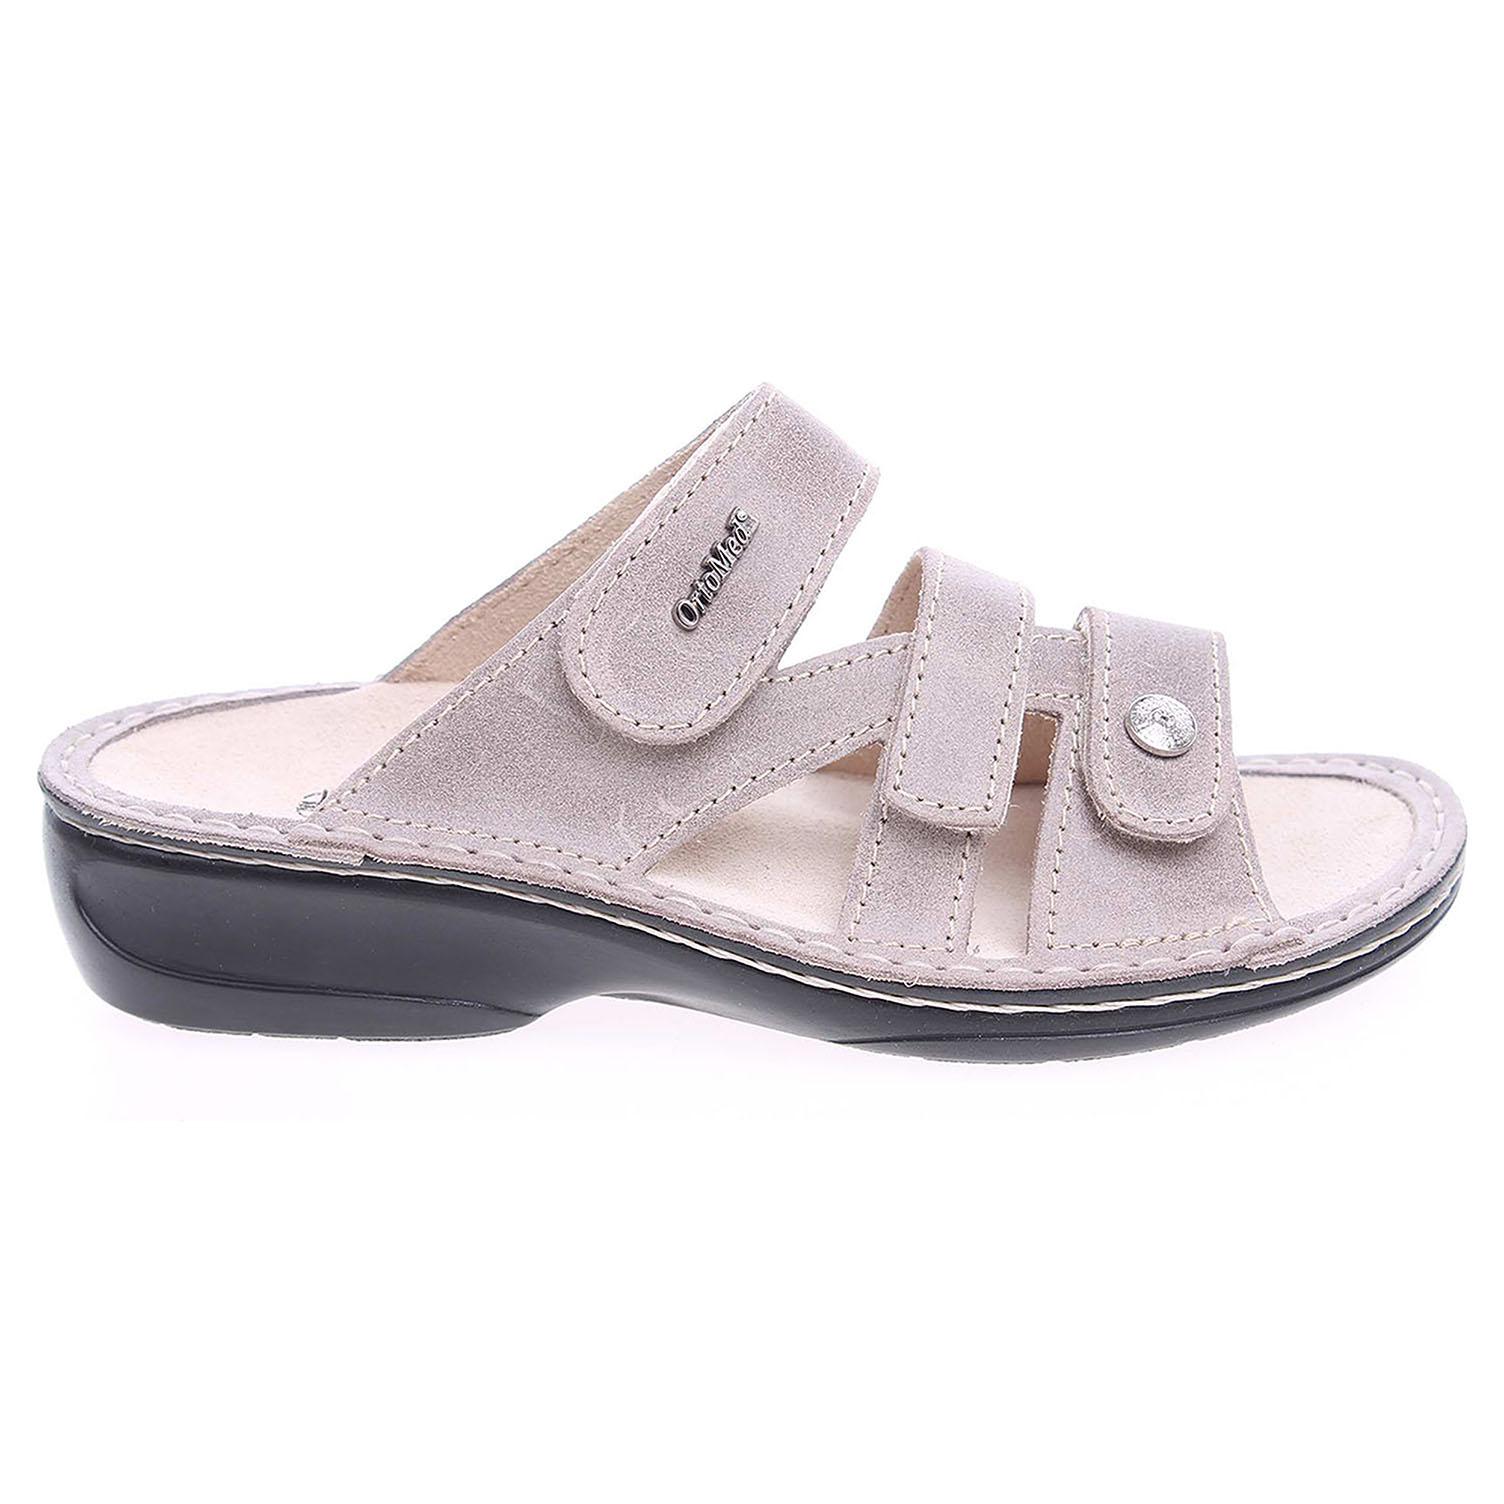 Ecco OrtoMed dámské pantofle 3715-012-P61 béžové 23400278 6ec33975cef